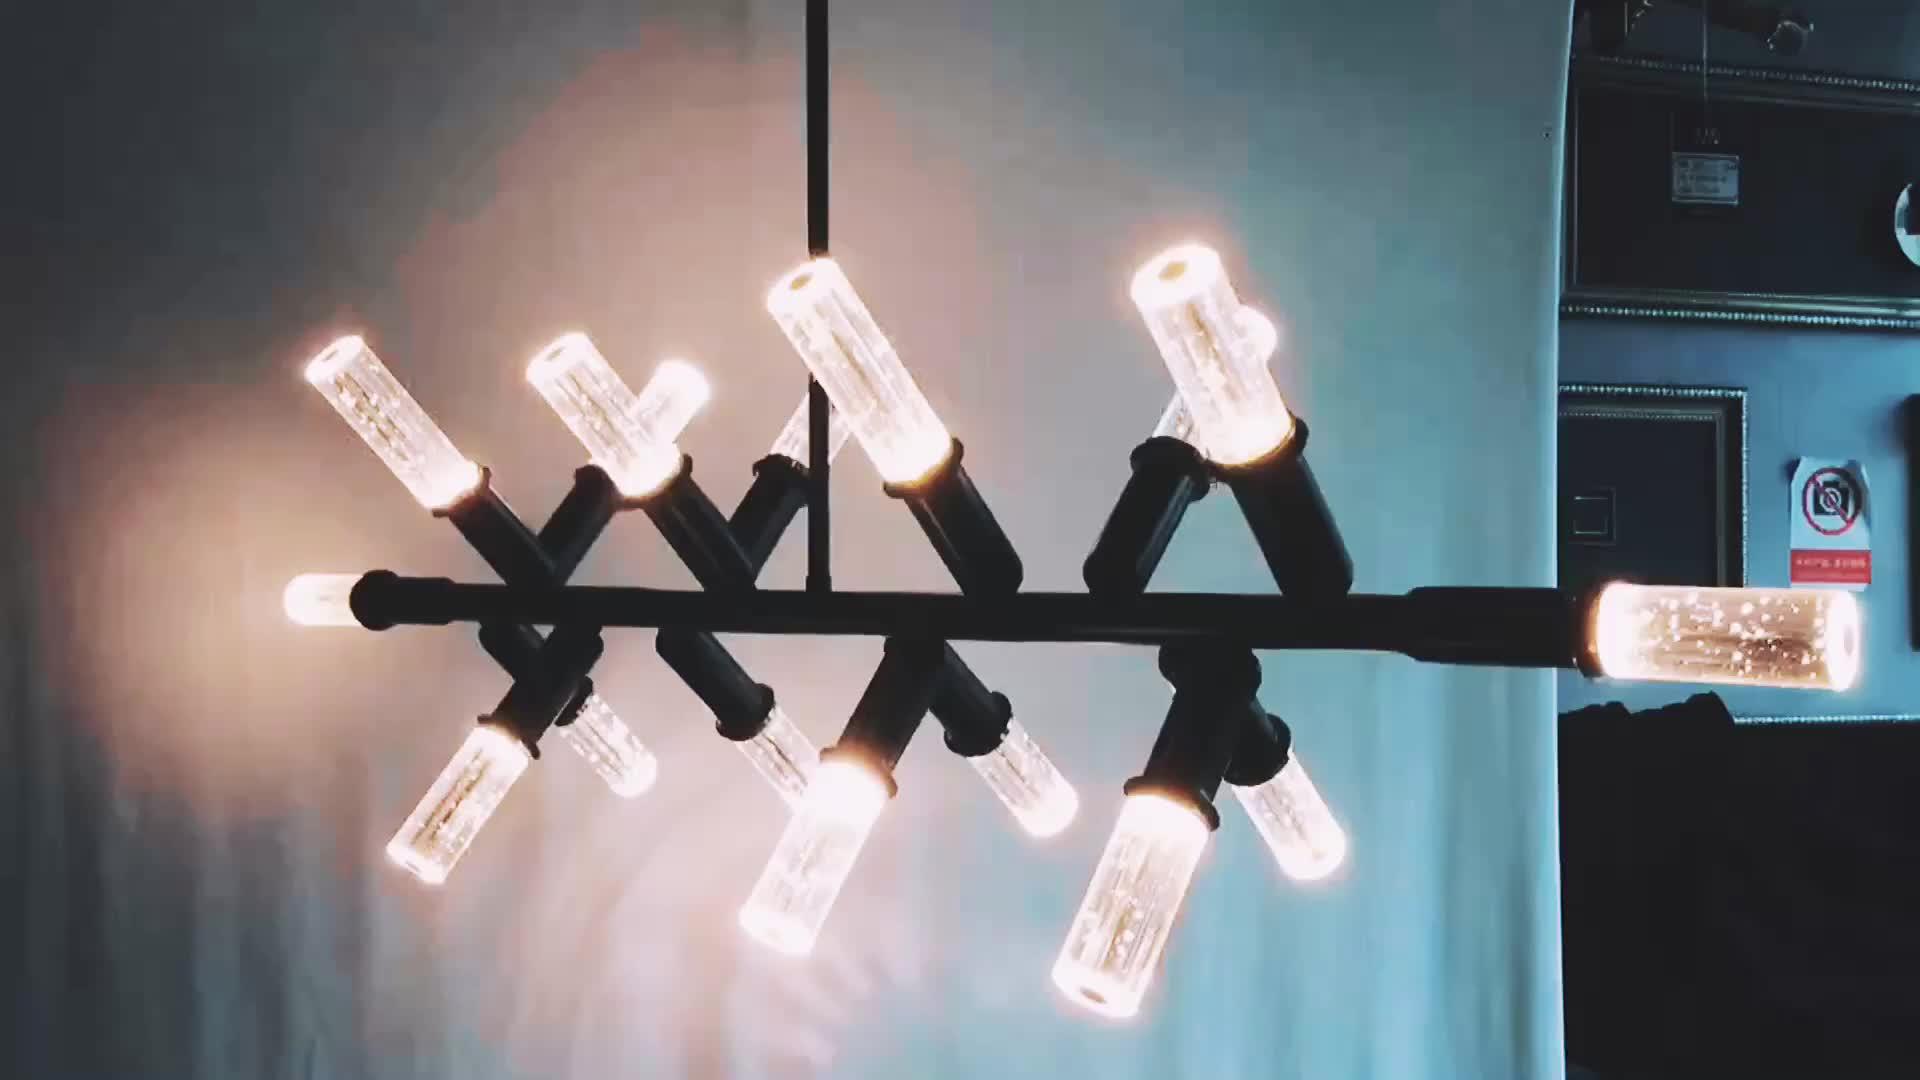 Restaurant decorative black rectangle hanging lamp dining table top modern luxury k9 crystal chandelier light